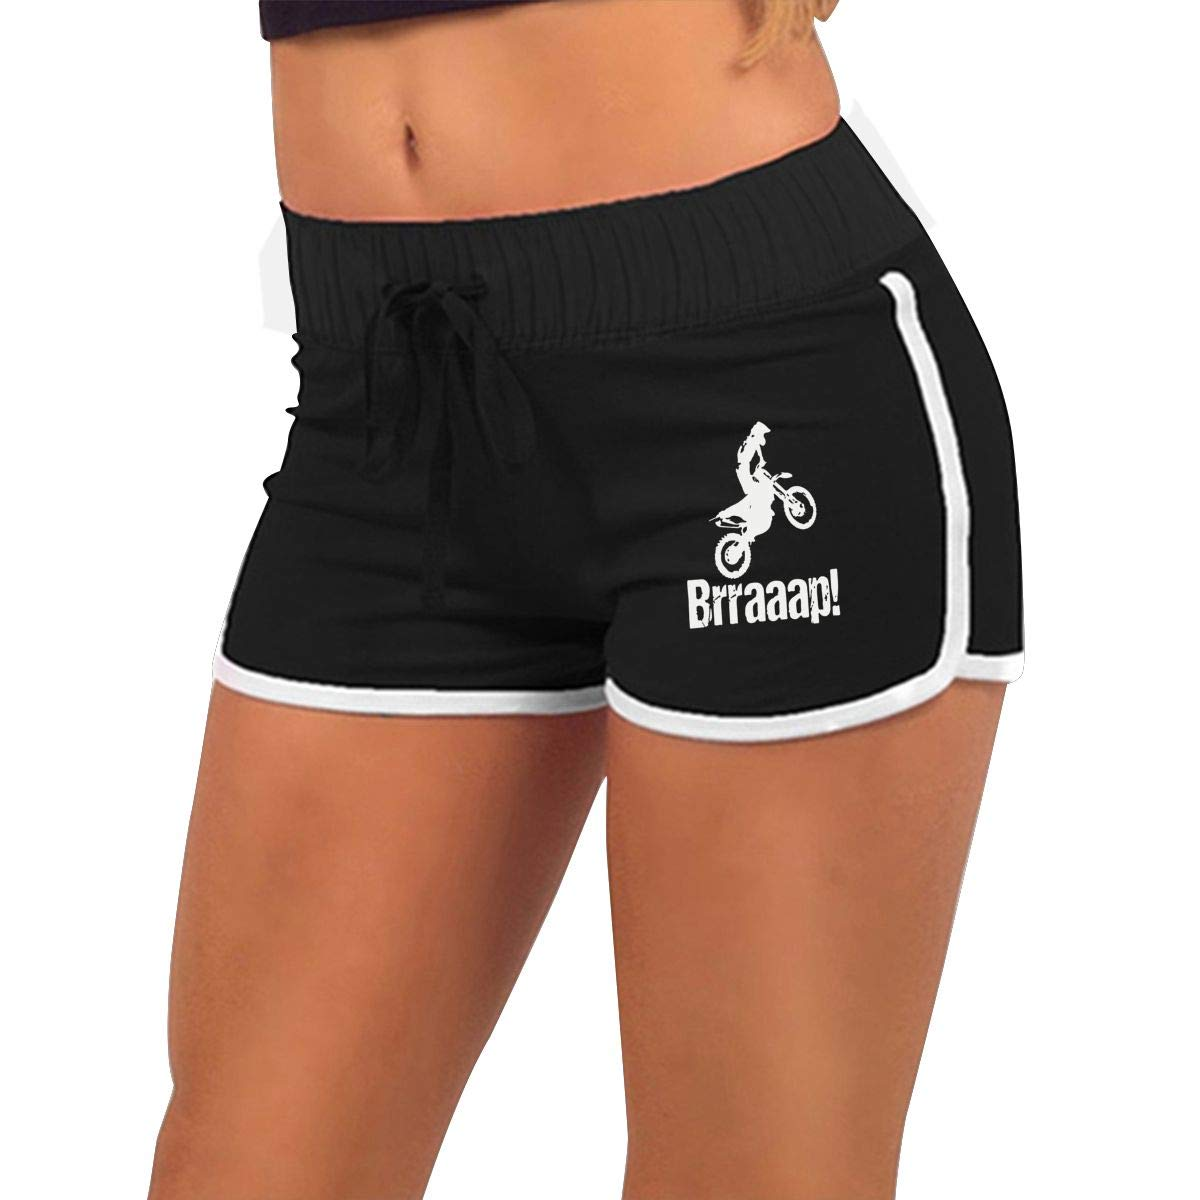 Q22-PI Woman Brraaap Dirt Bike Motocross Running Workout Shorts Pants with Athletic Elastic Waist